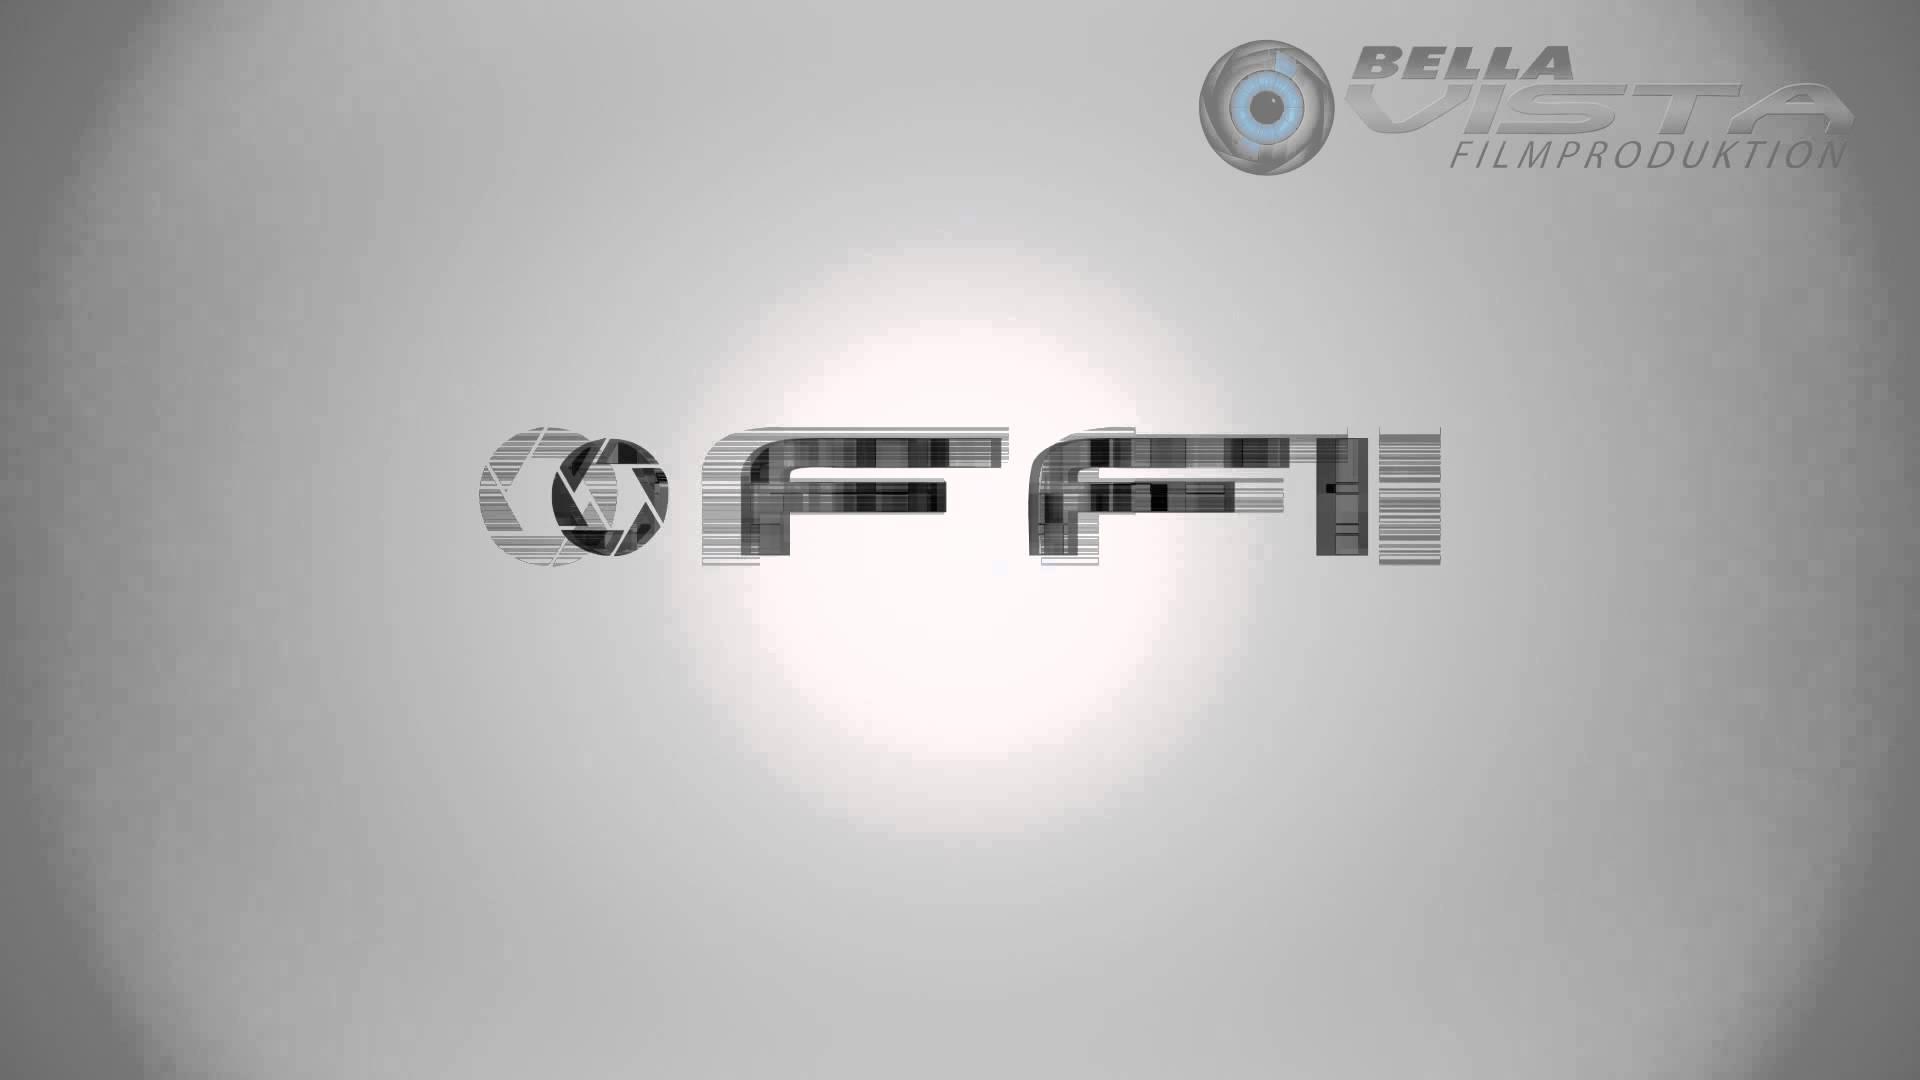 FFI BellaVista